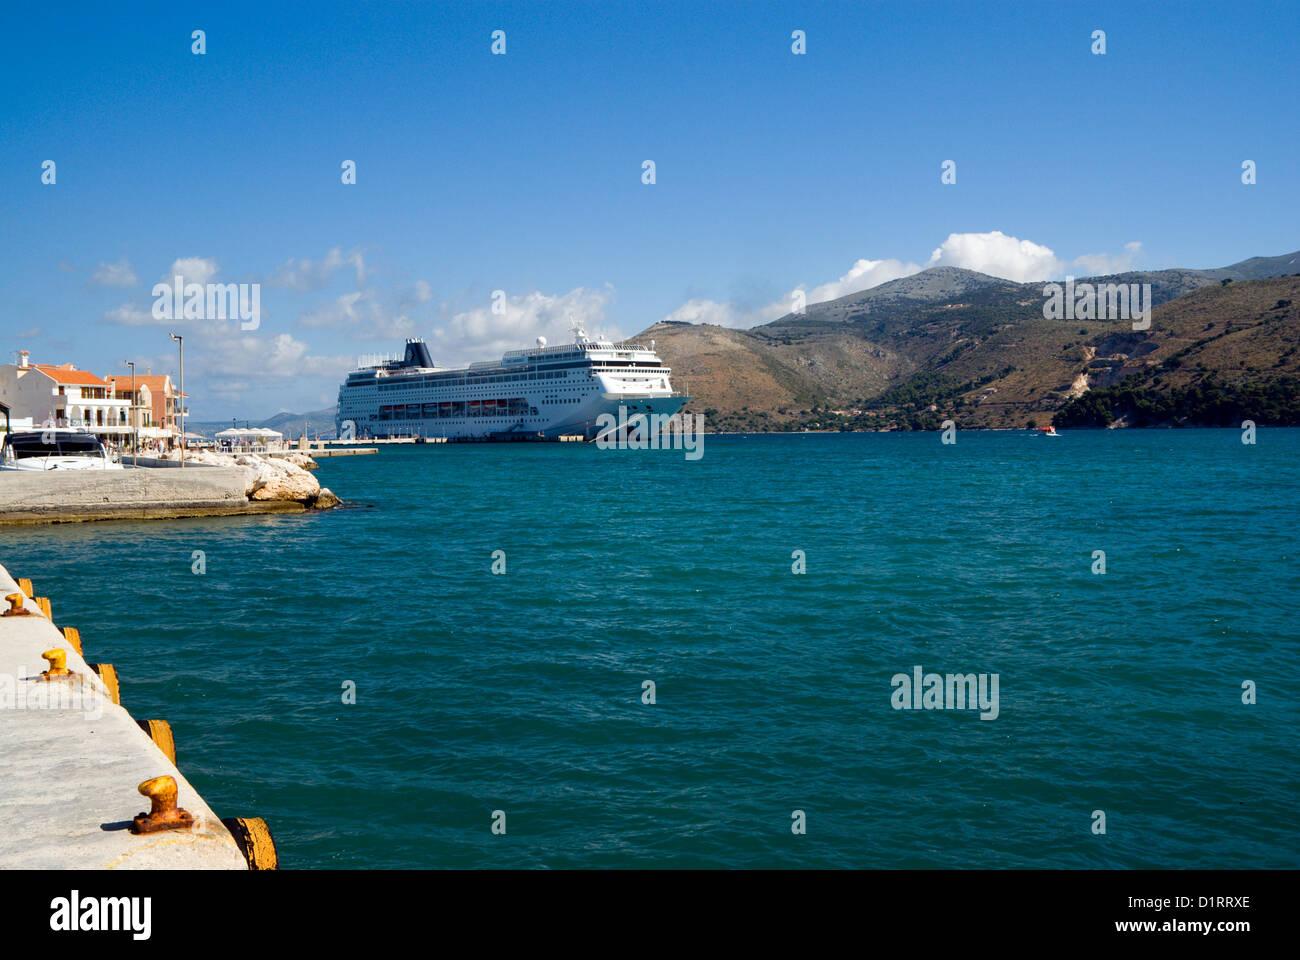 Cruise ship MSC Armonia moored in Argostoli Bay, Arostoli, Kefalonia, Ionian Islands, Greece. - Stock Image